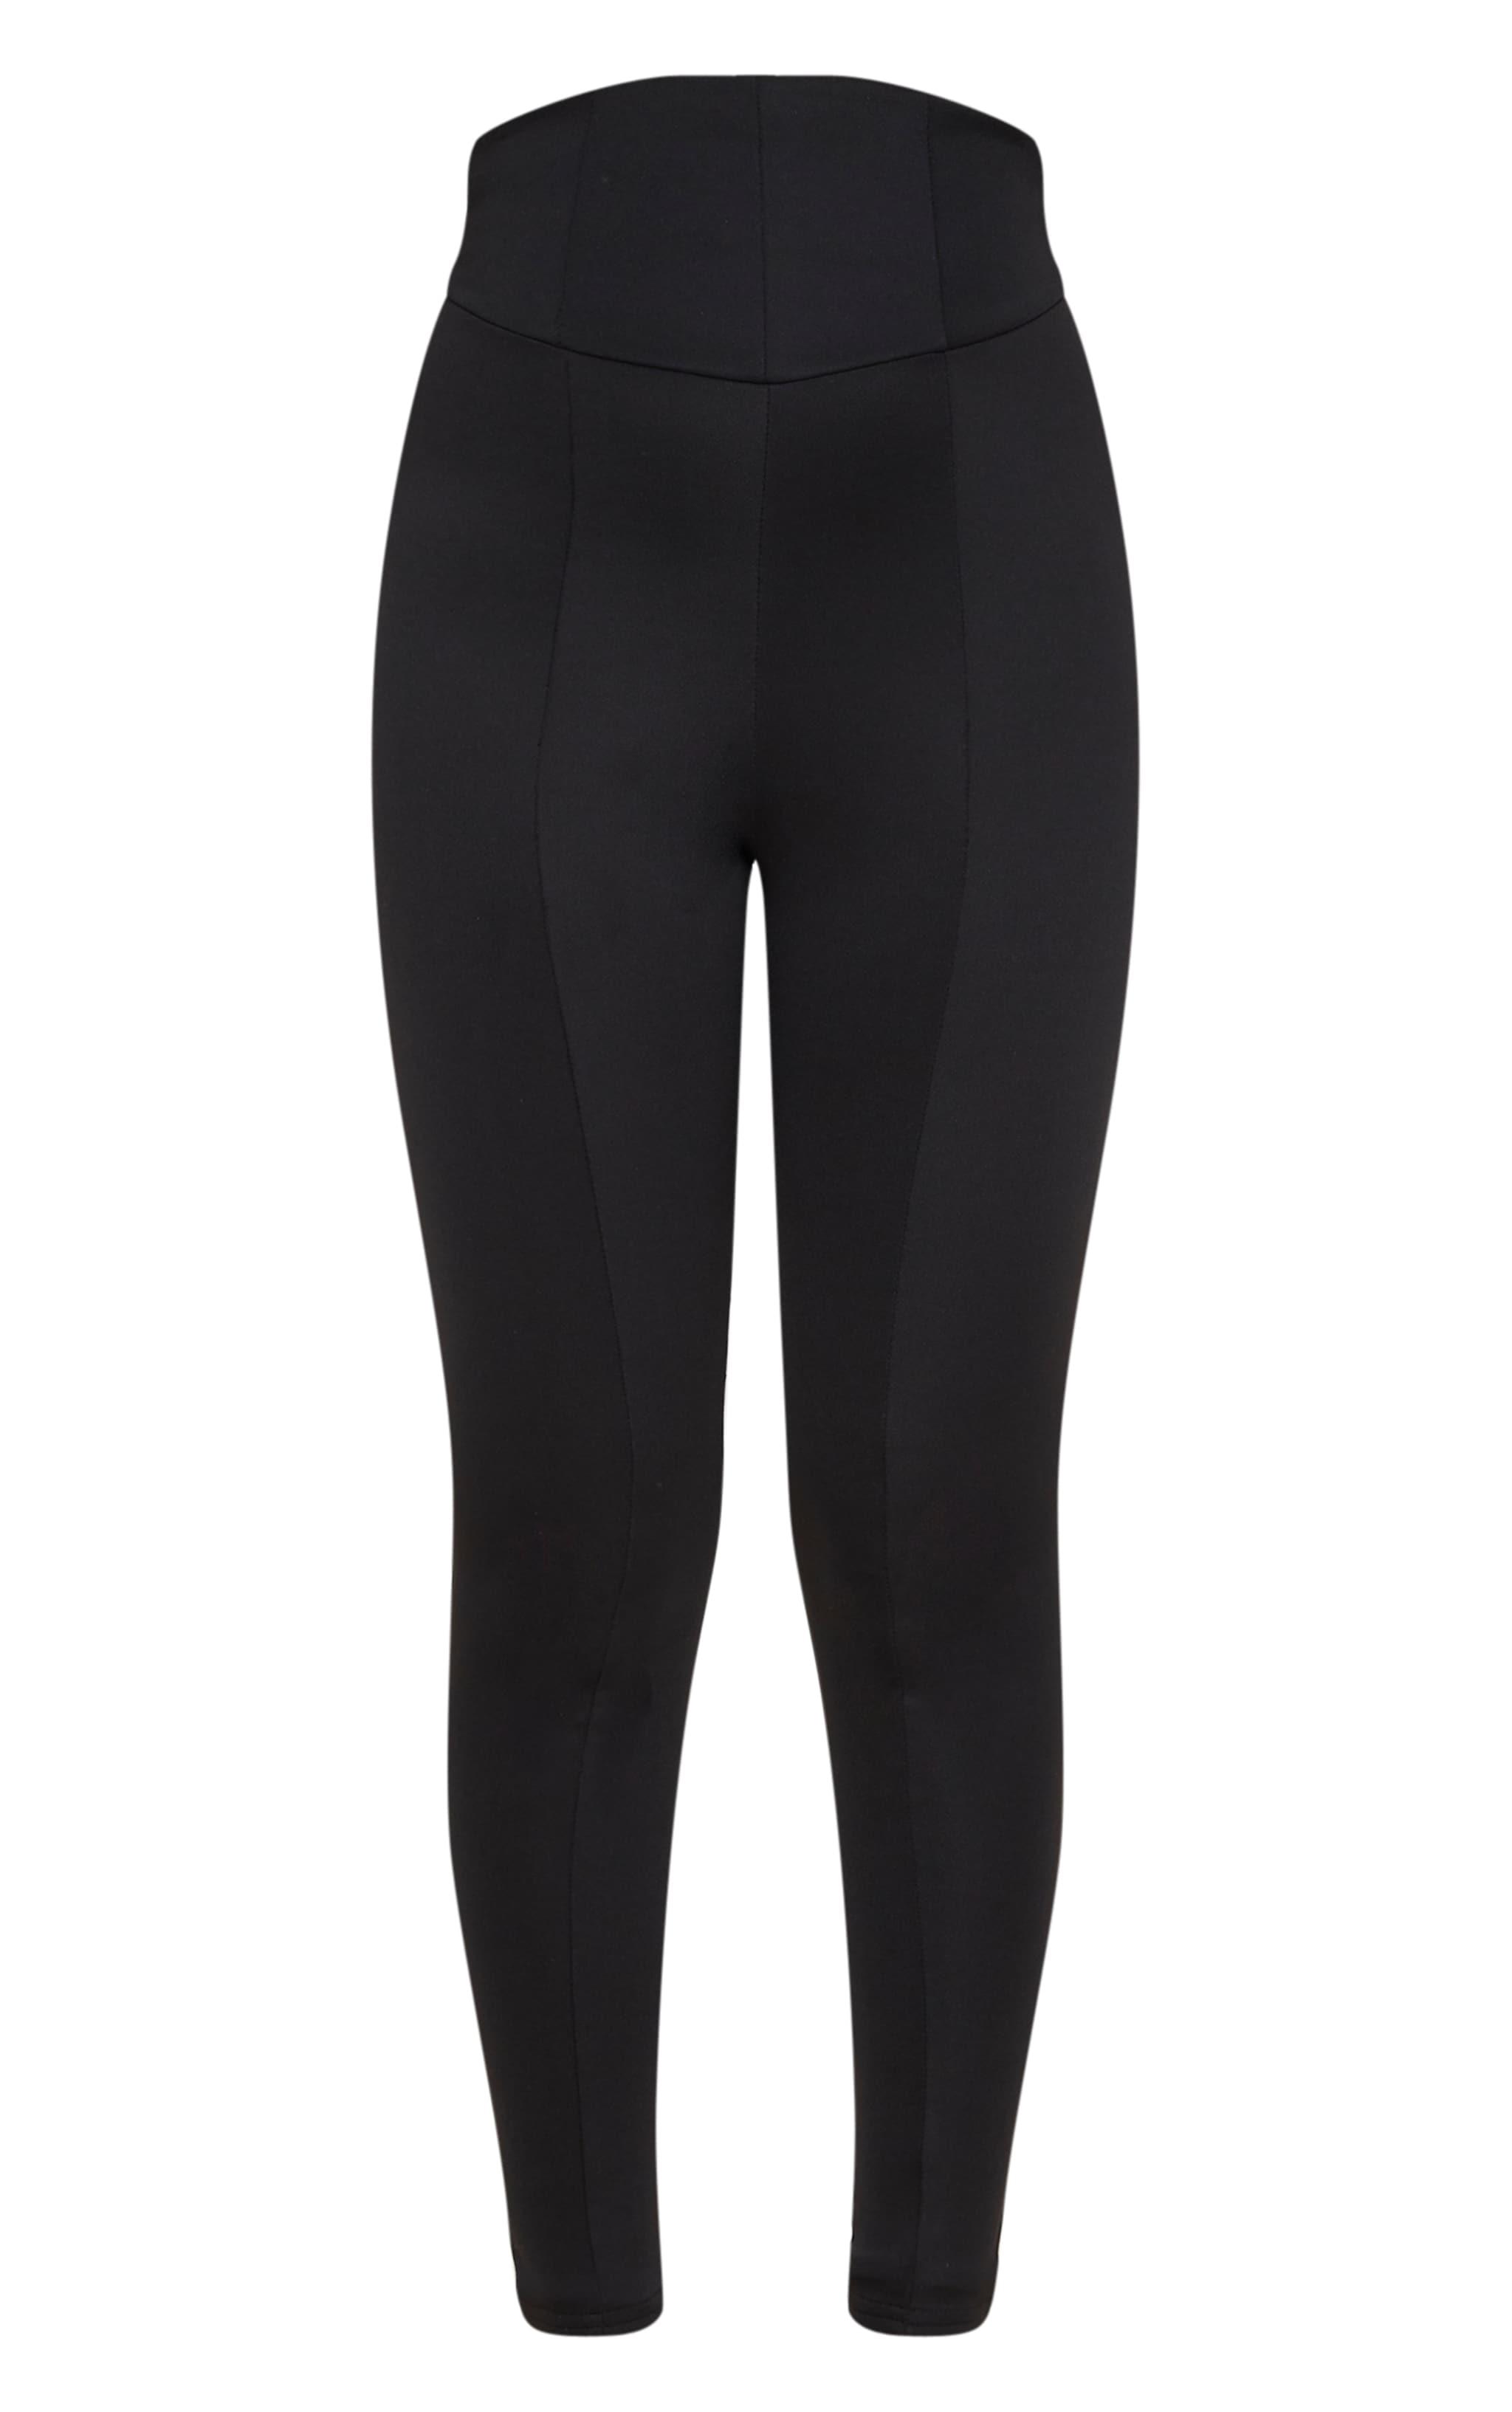 Petite Black  Extreme High Waist Leggings 3